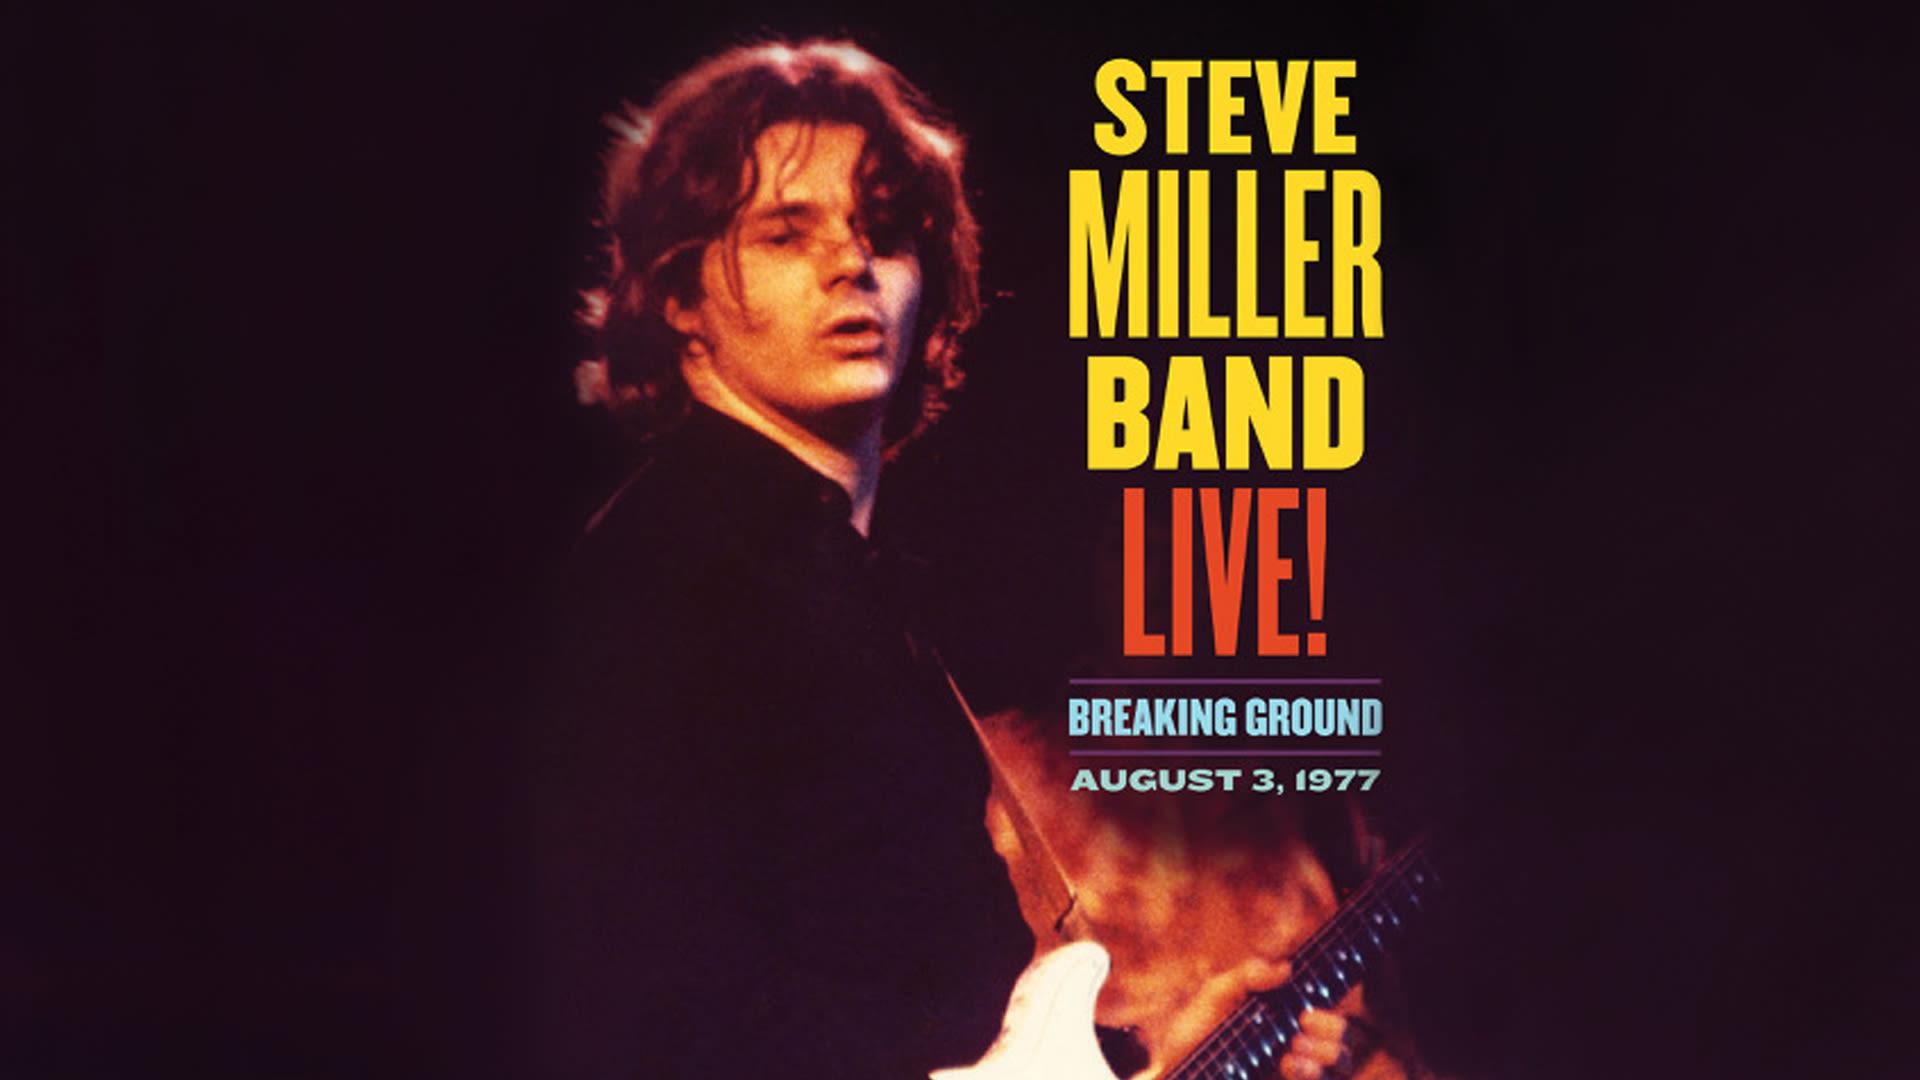 Live! Breaking Ground